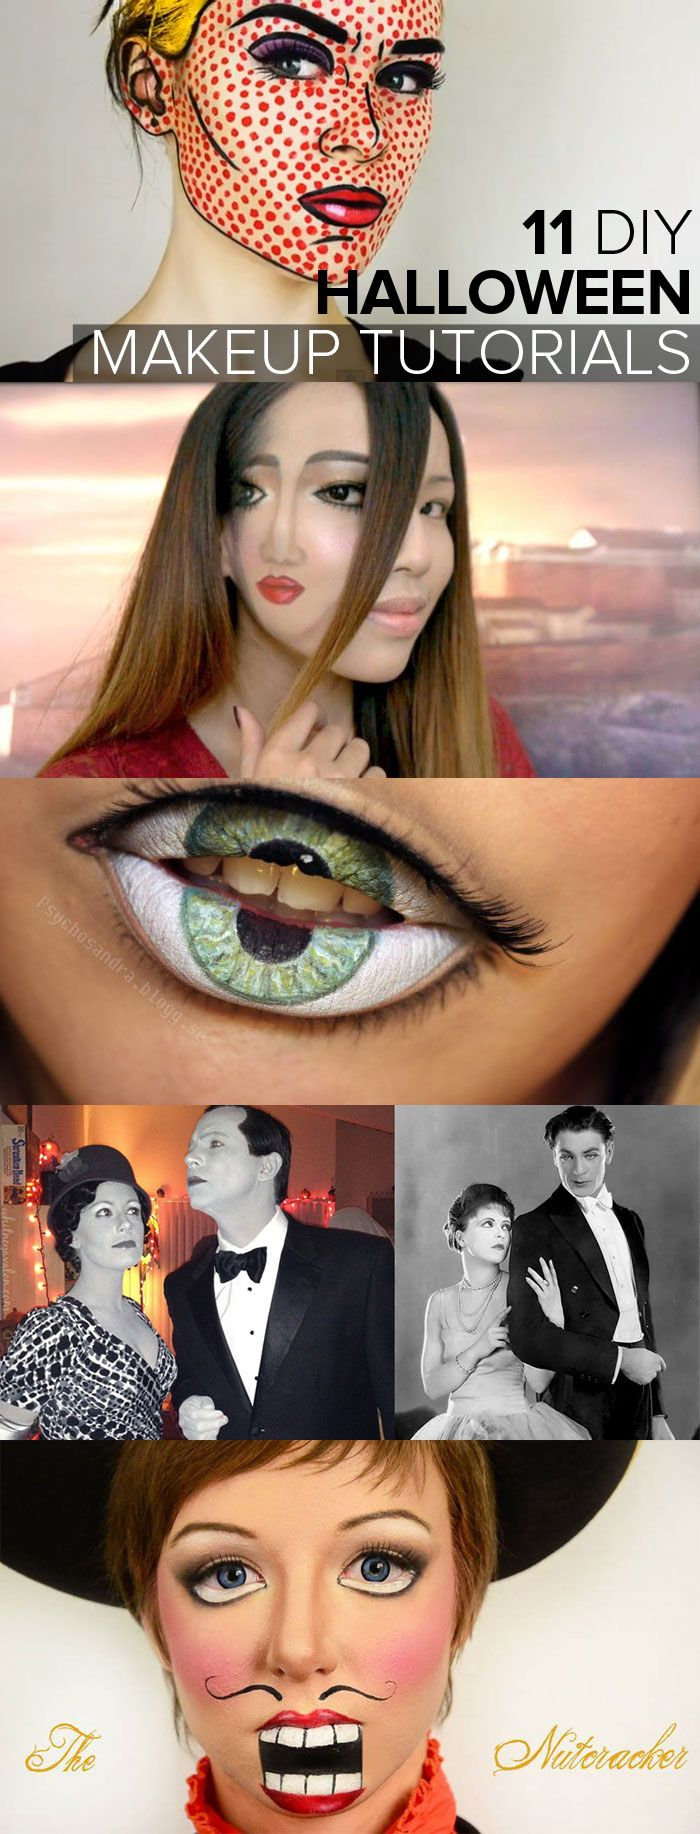 11 DIY Halloween Makeup Tutorials | PMD Personal Microderm